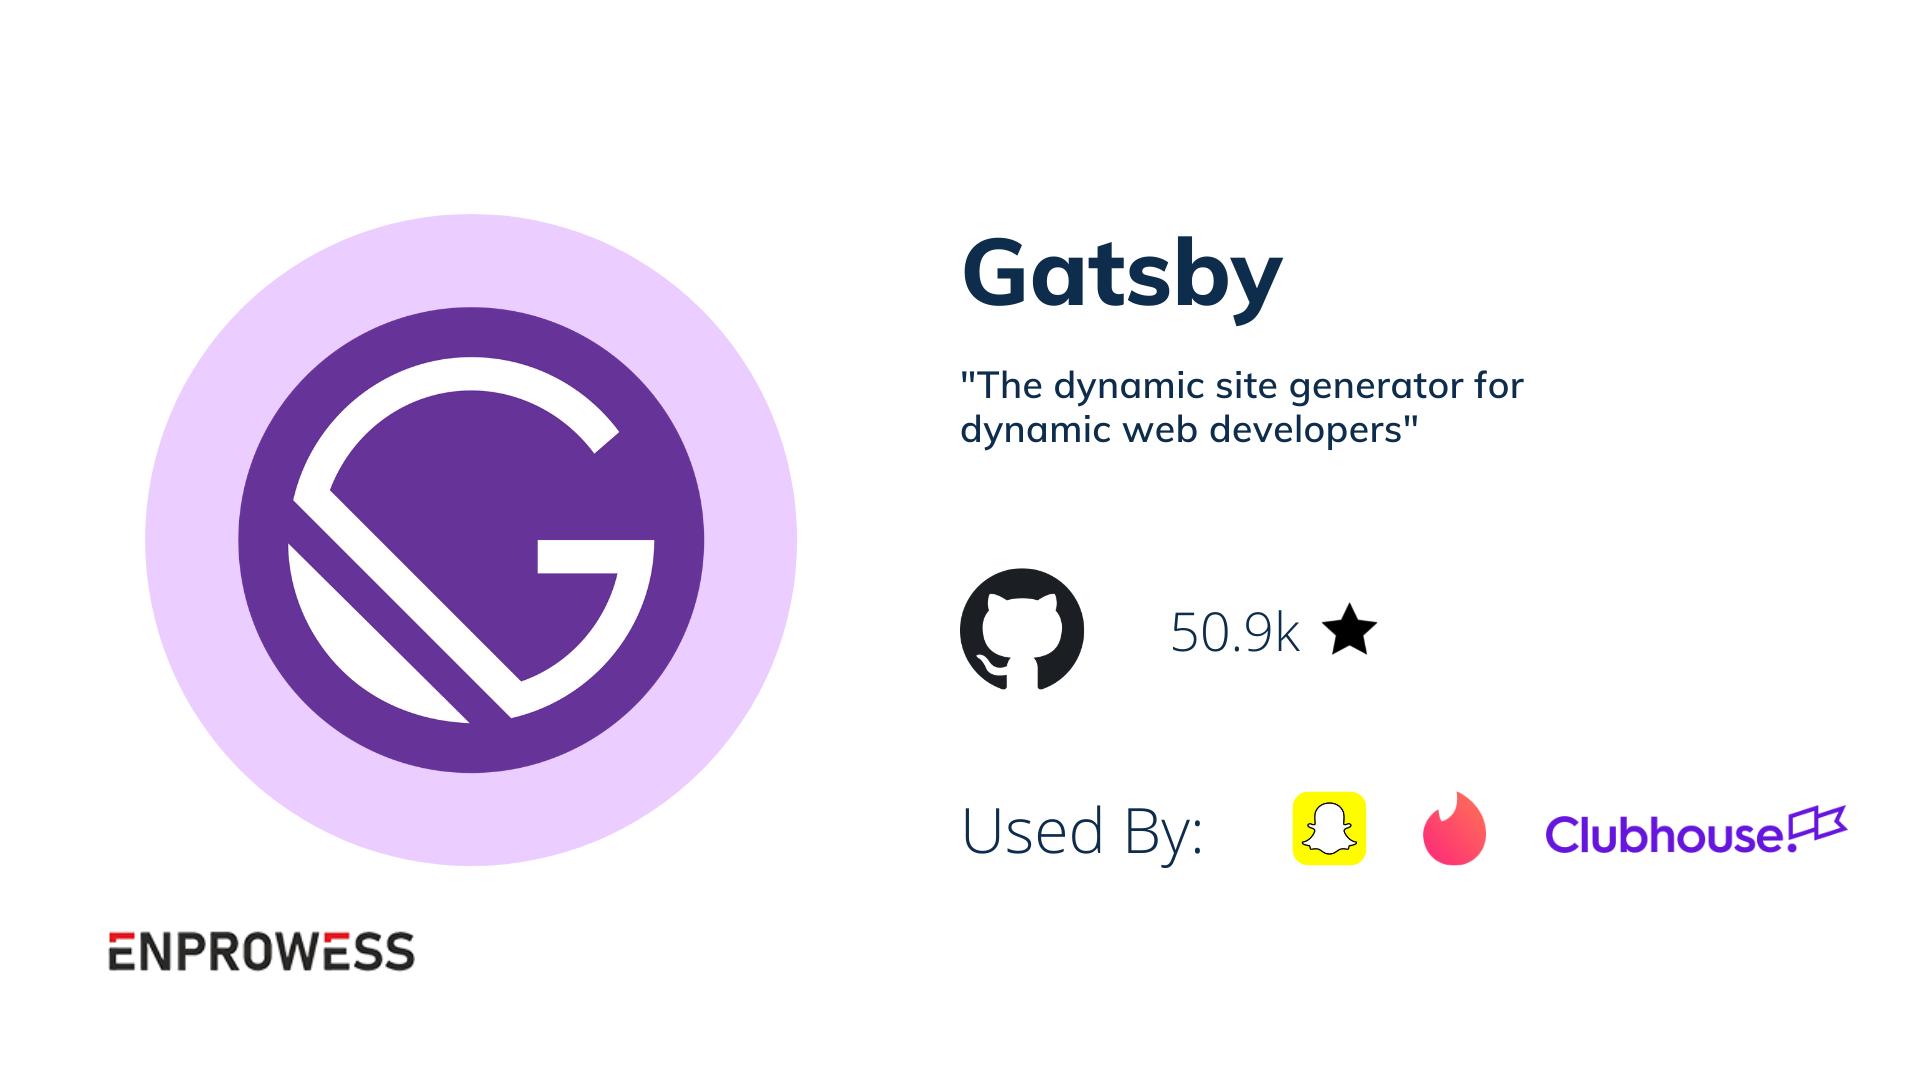 Gatsby details